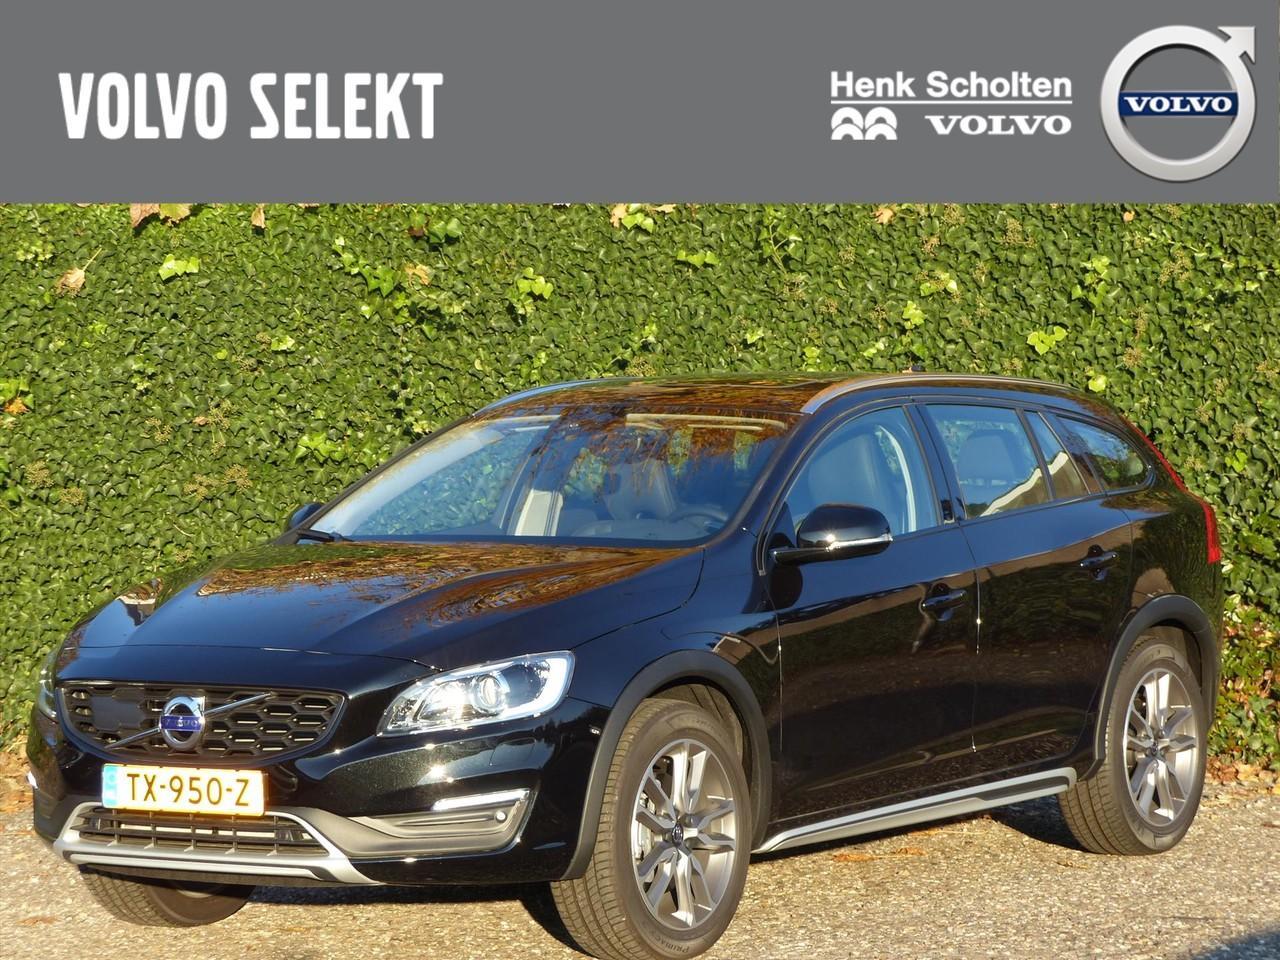 Volvo V60 cross country T5 245pk gt polar+ luxury, comfort line, res. wiel